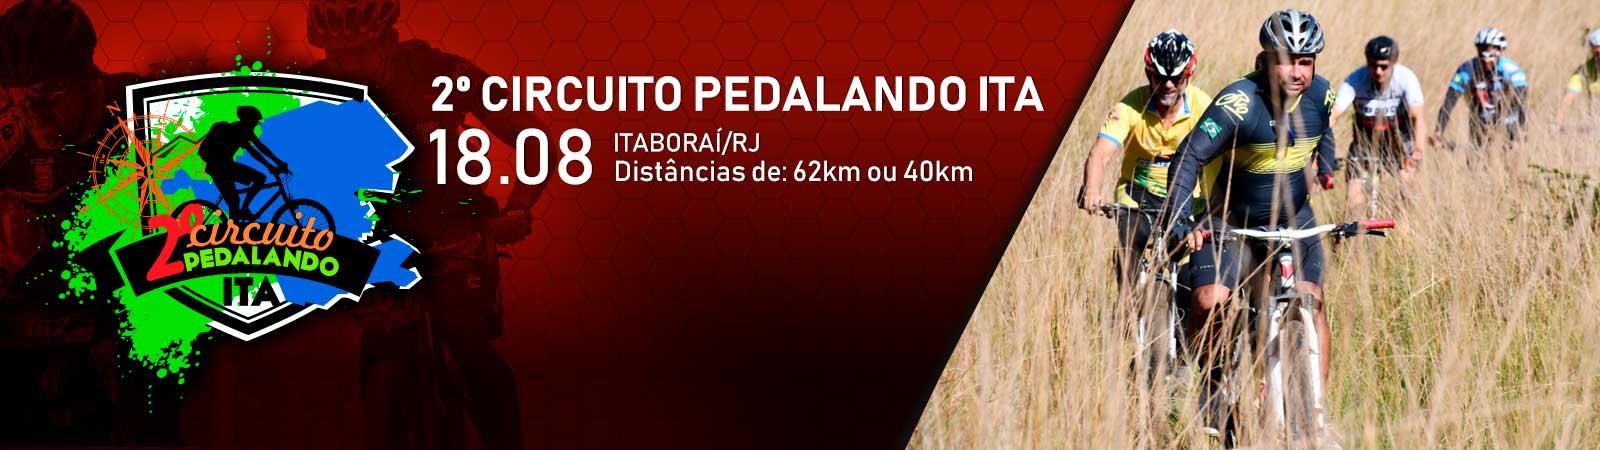 2º CIRCUITO PEDALANDO ITA - 2019